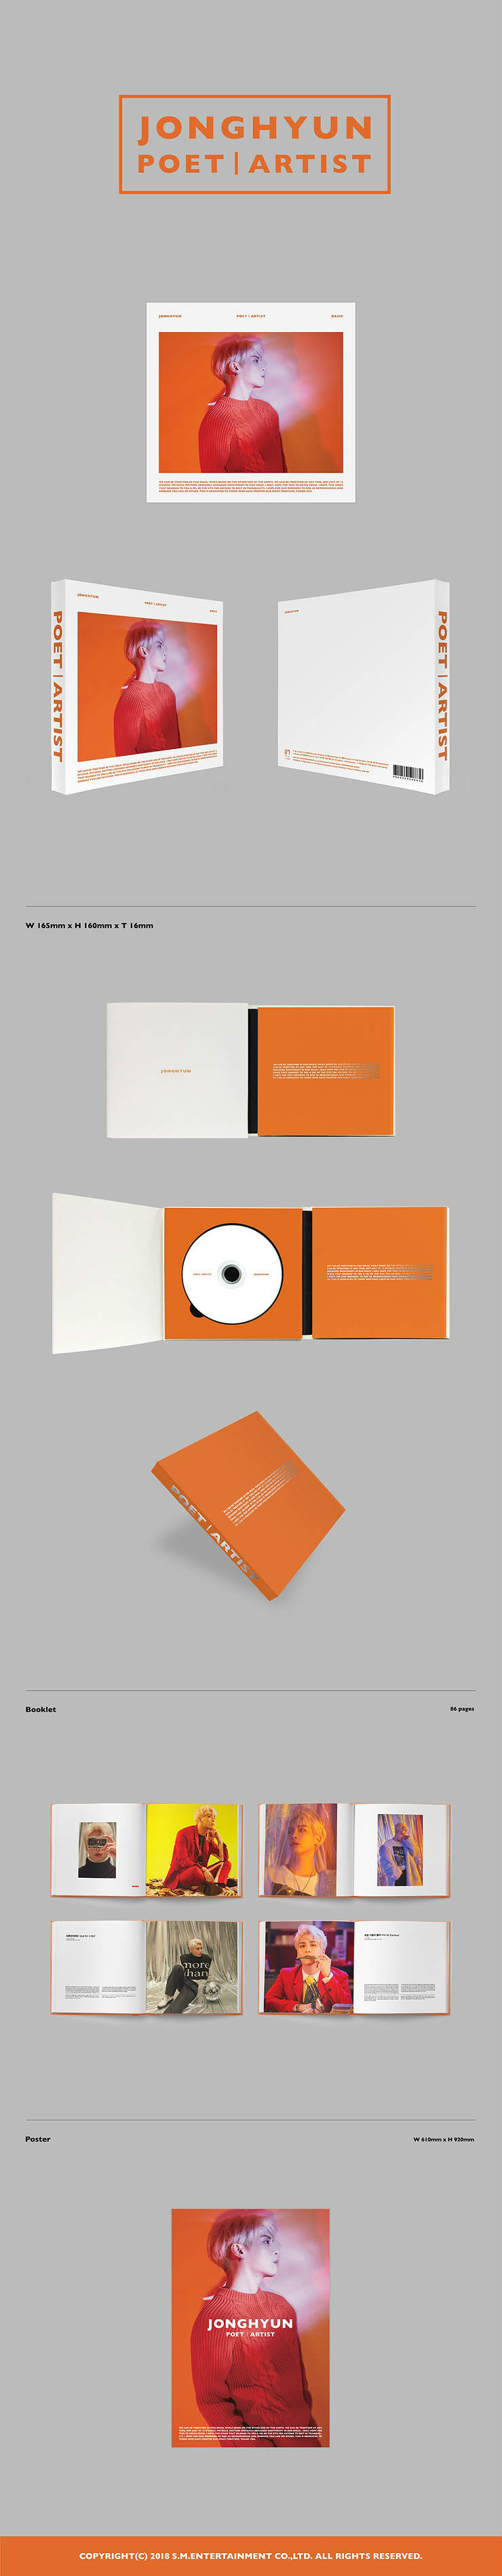 [2nd Pre-order]JONGHYUN - POET l ARTIST